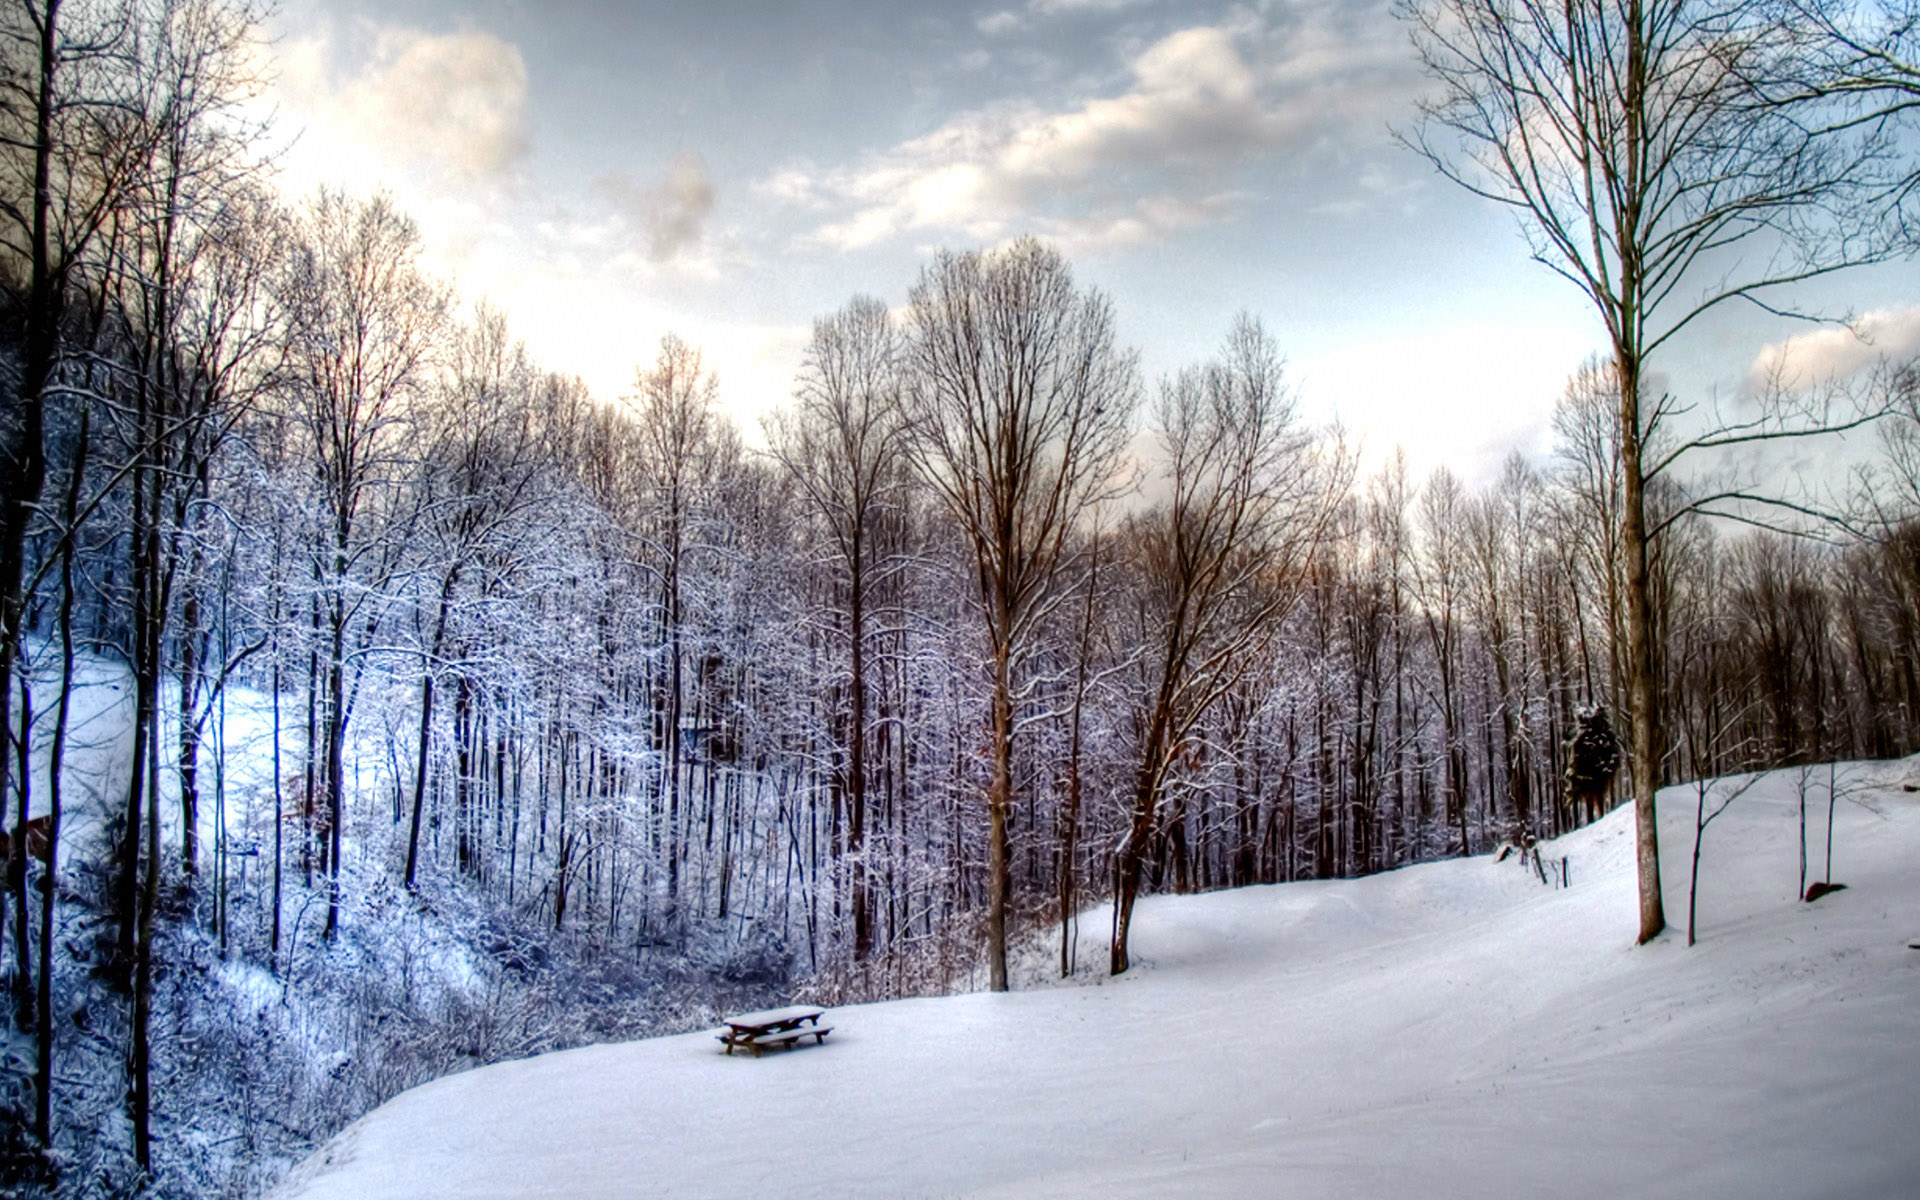 19201200 Widescreen Winter Snow Scenes   Dreamy Winter Snow 1920x1200